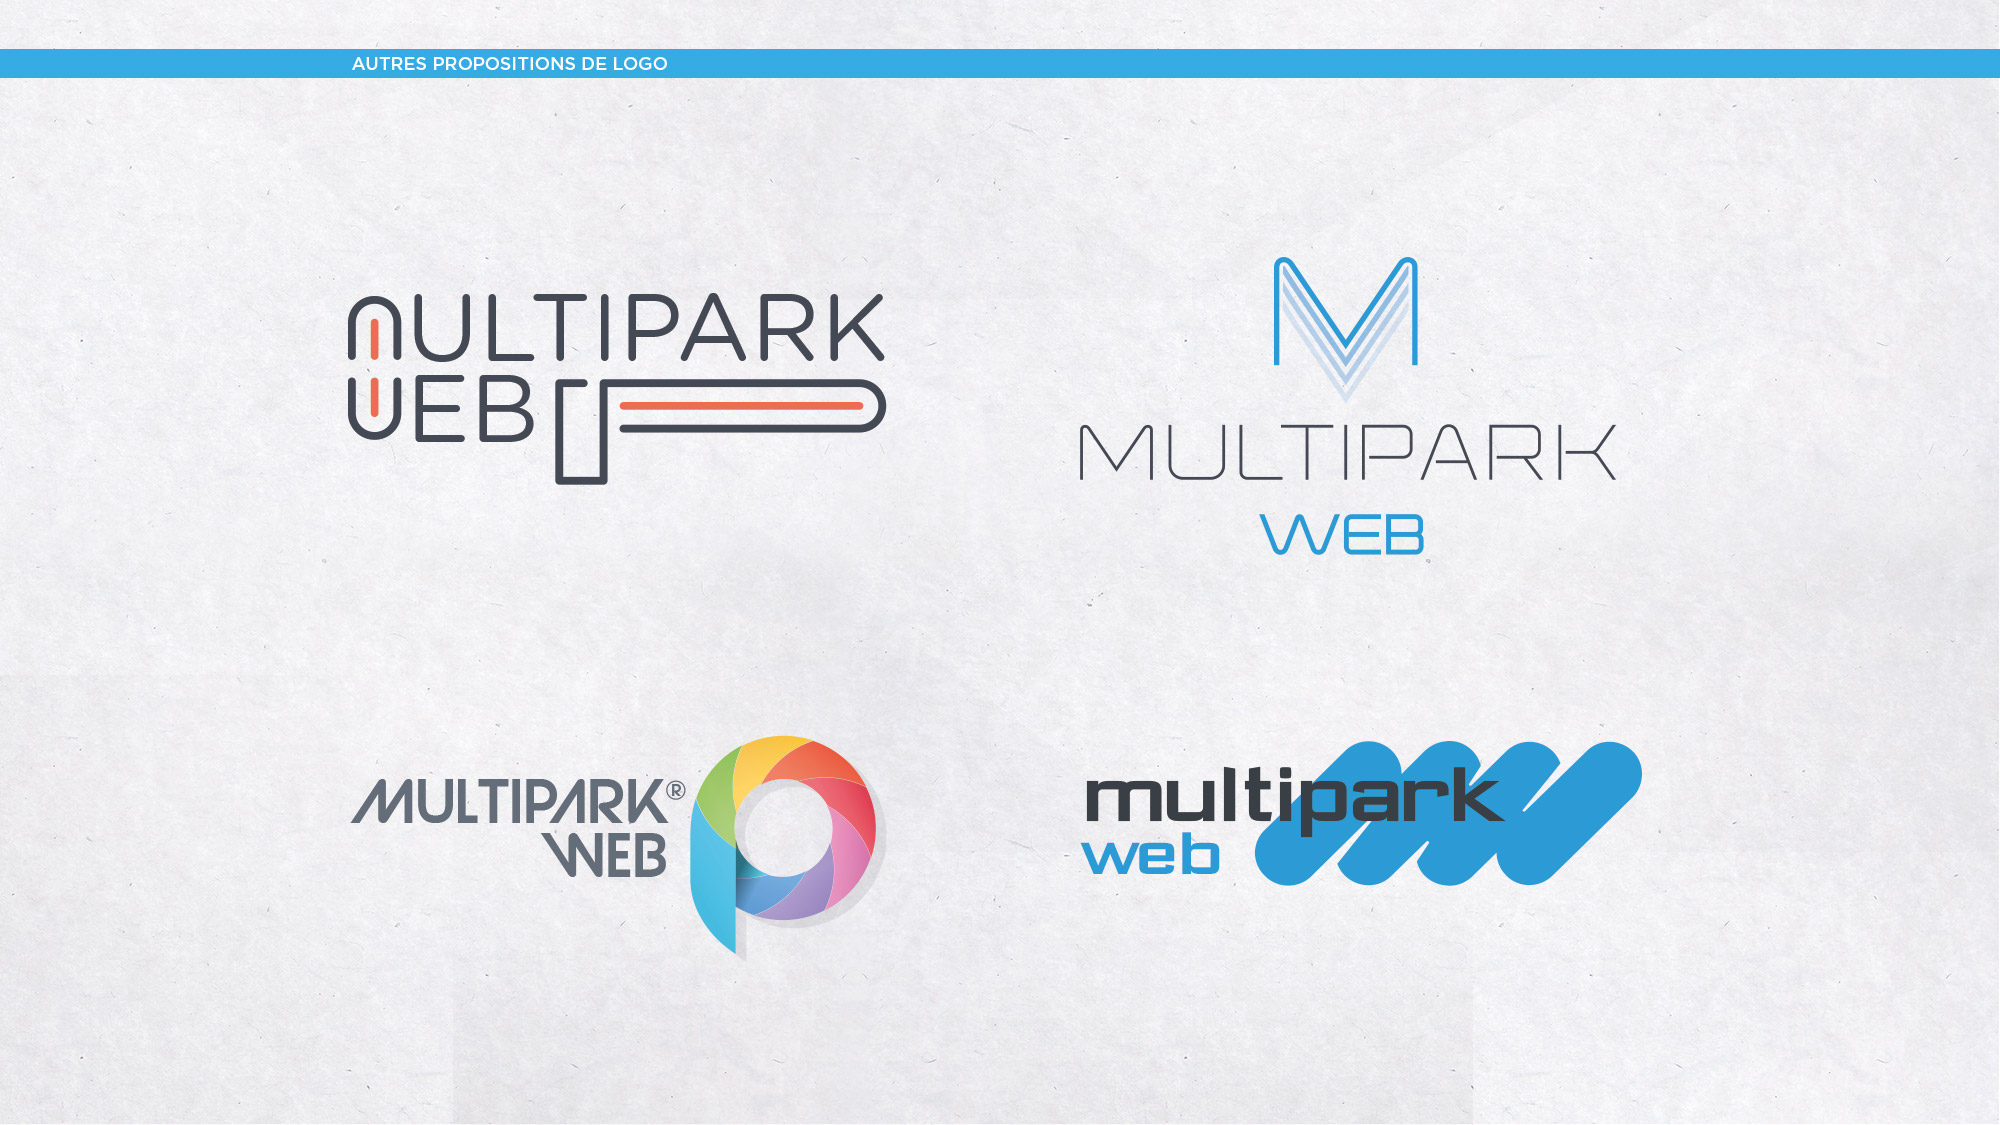 MultiparkWeb_Rea_Logo2_AutresLogos.jpg